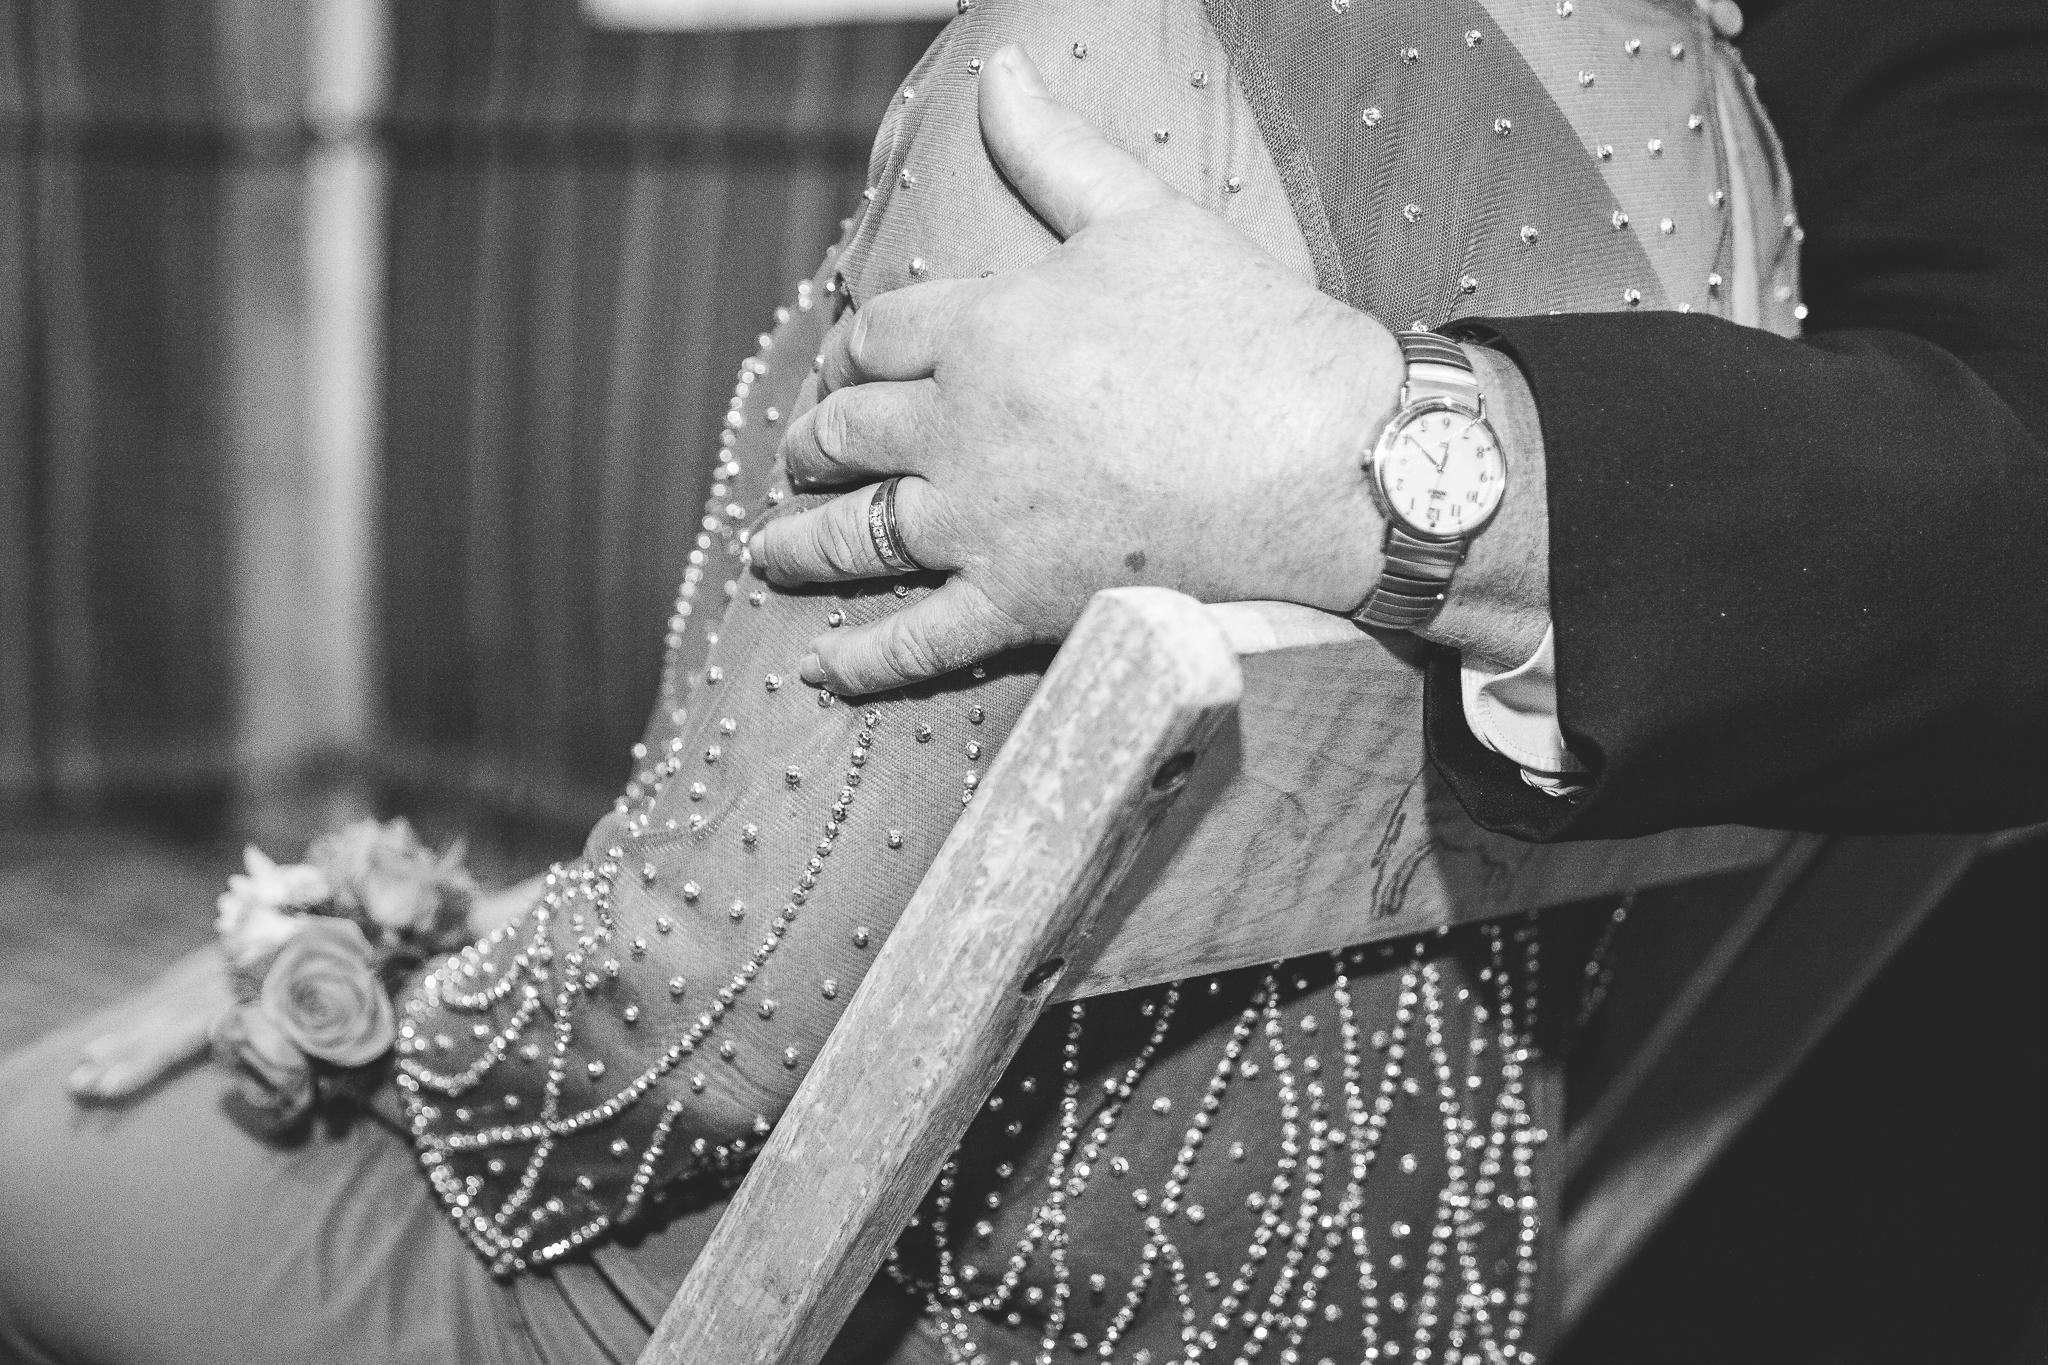 camuglia-whomstudio-chelsea_and_andy-nycphotographer-wedding-brooklyn-buffalo-timberlodge-087-0633.jpg